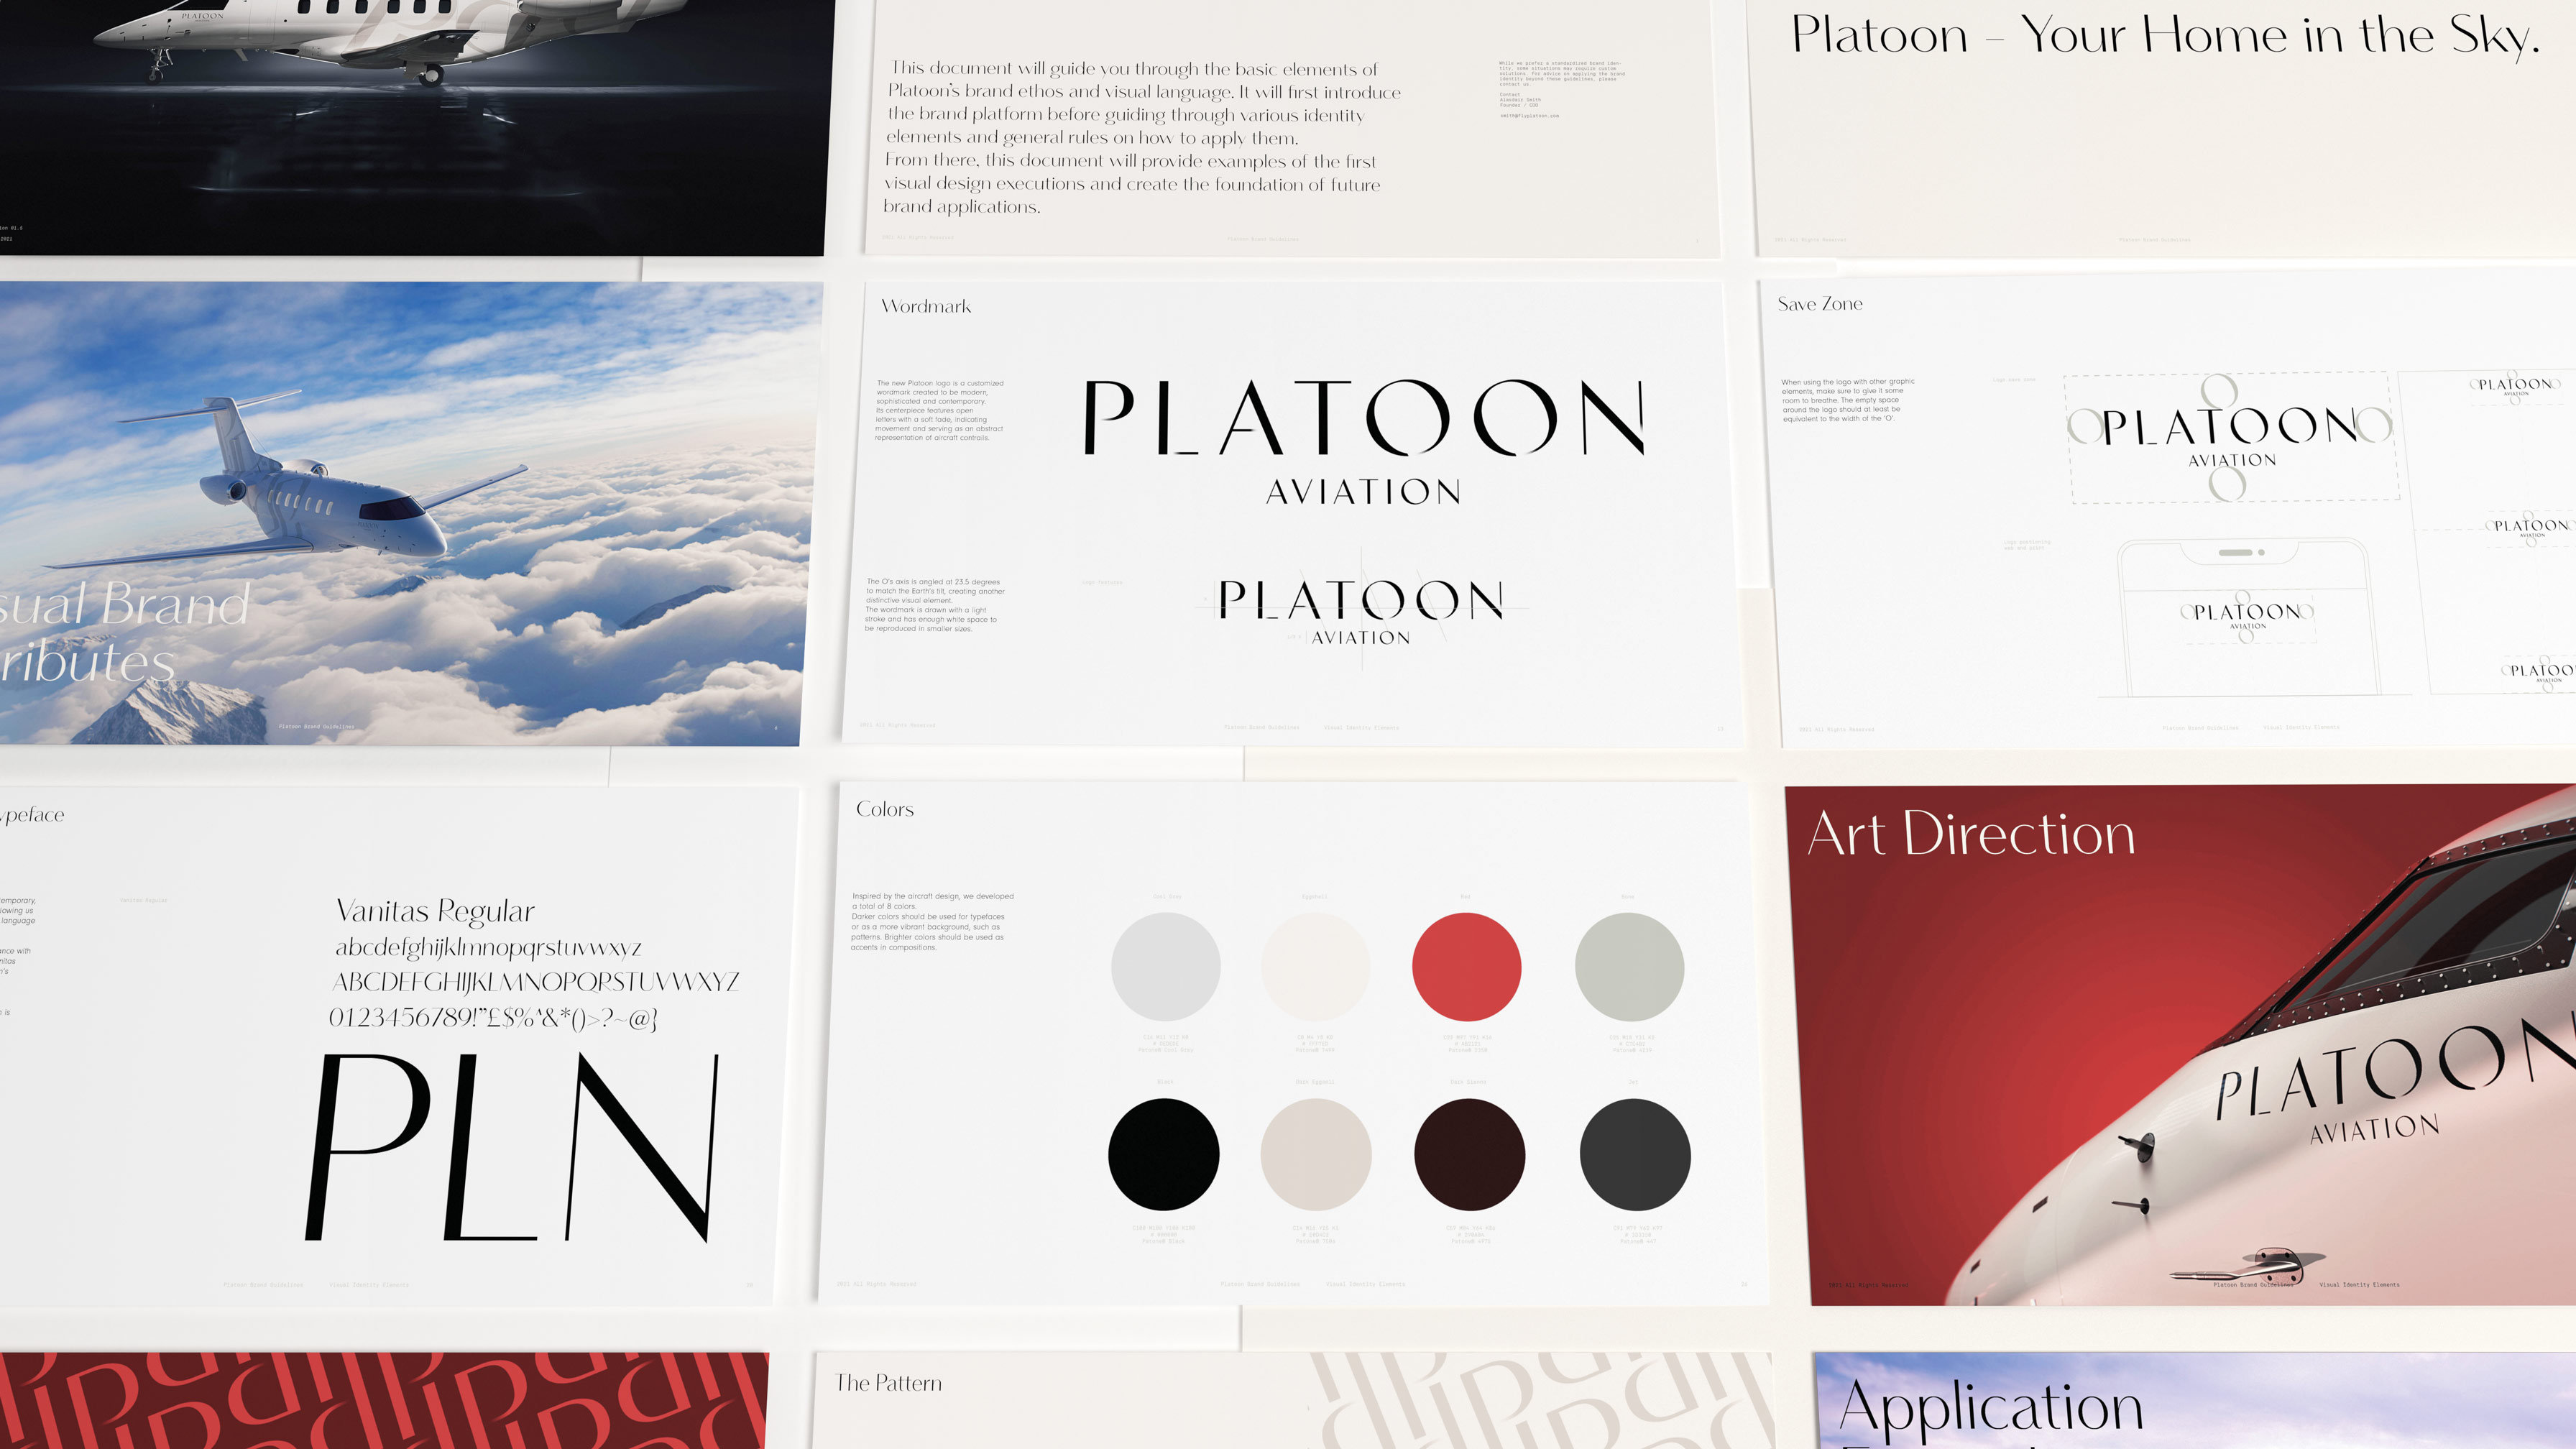 Platoon - Brand Guidelines